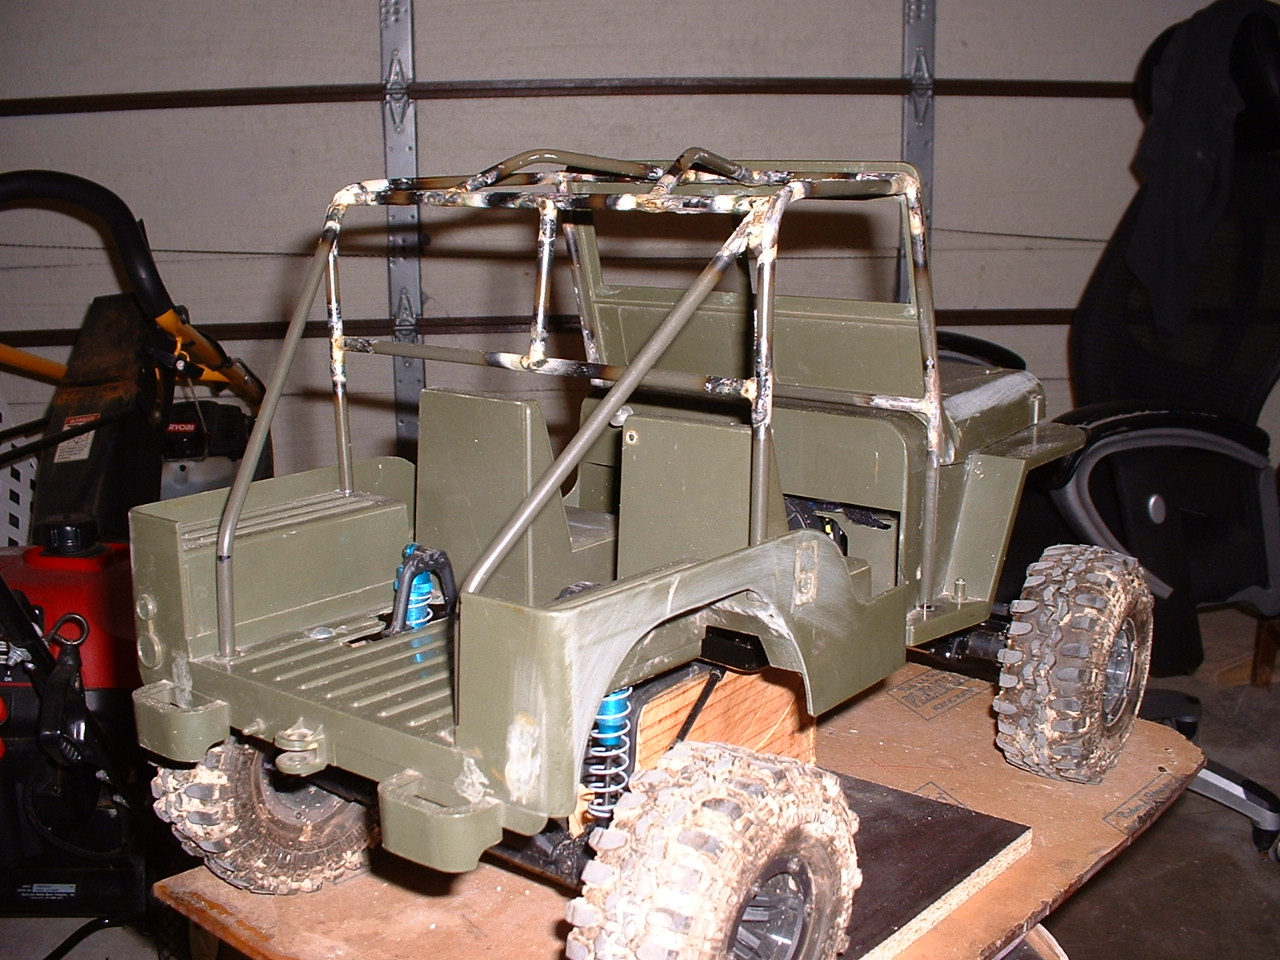 Click image for larger version  Name:GI Joe Jeep 5b 001.JPG Views:1132 Size:329.3 KB ID:2040907